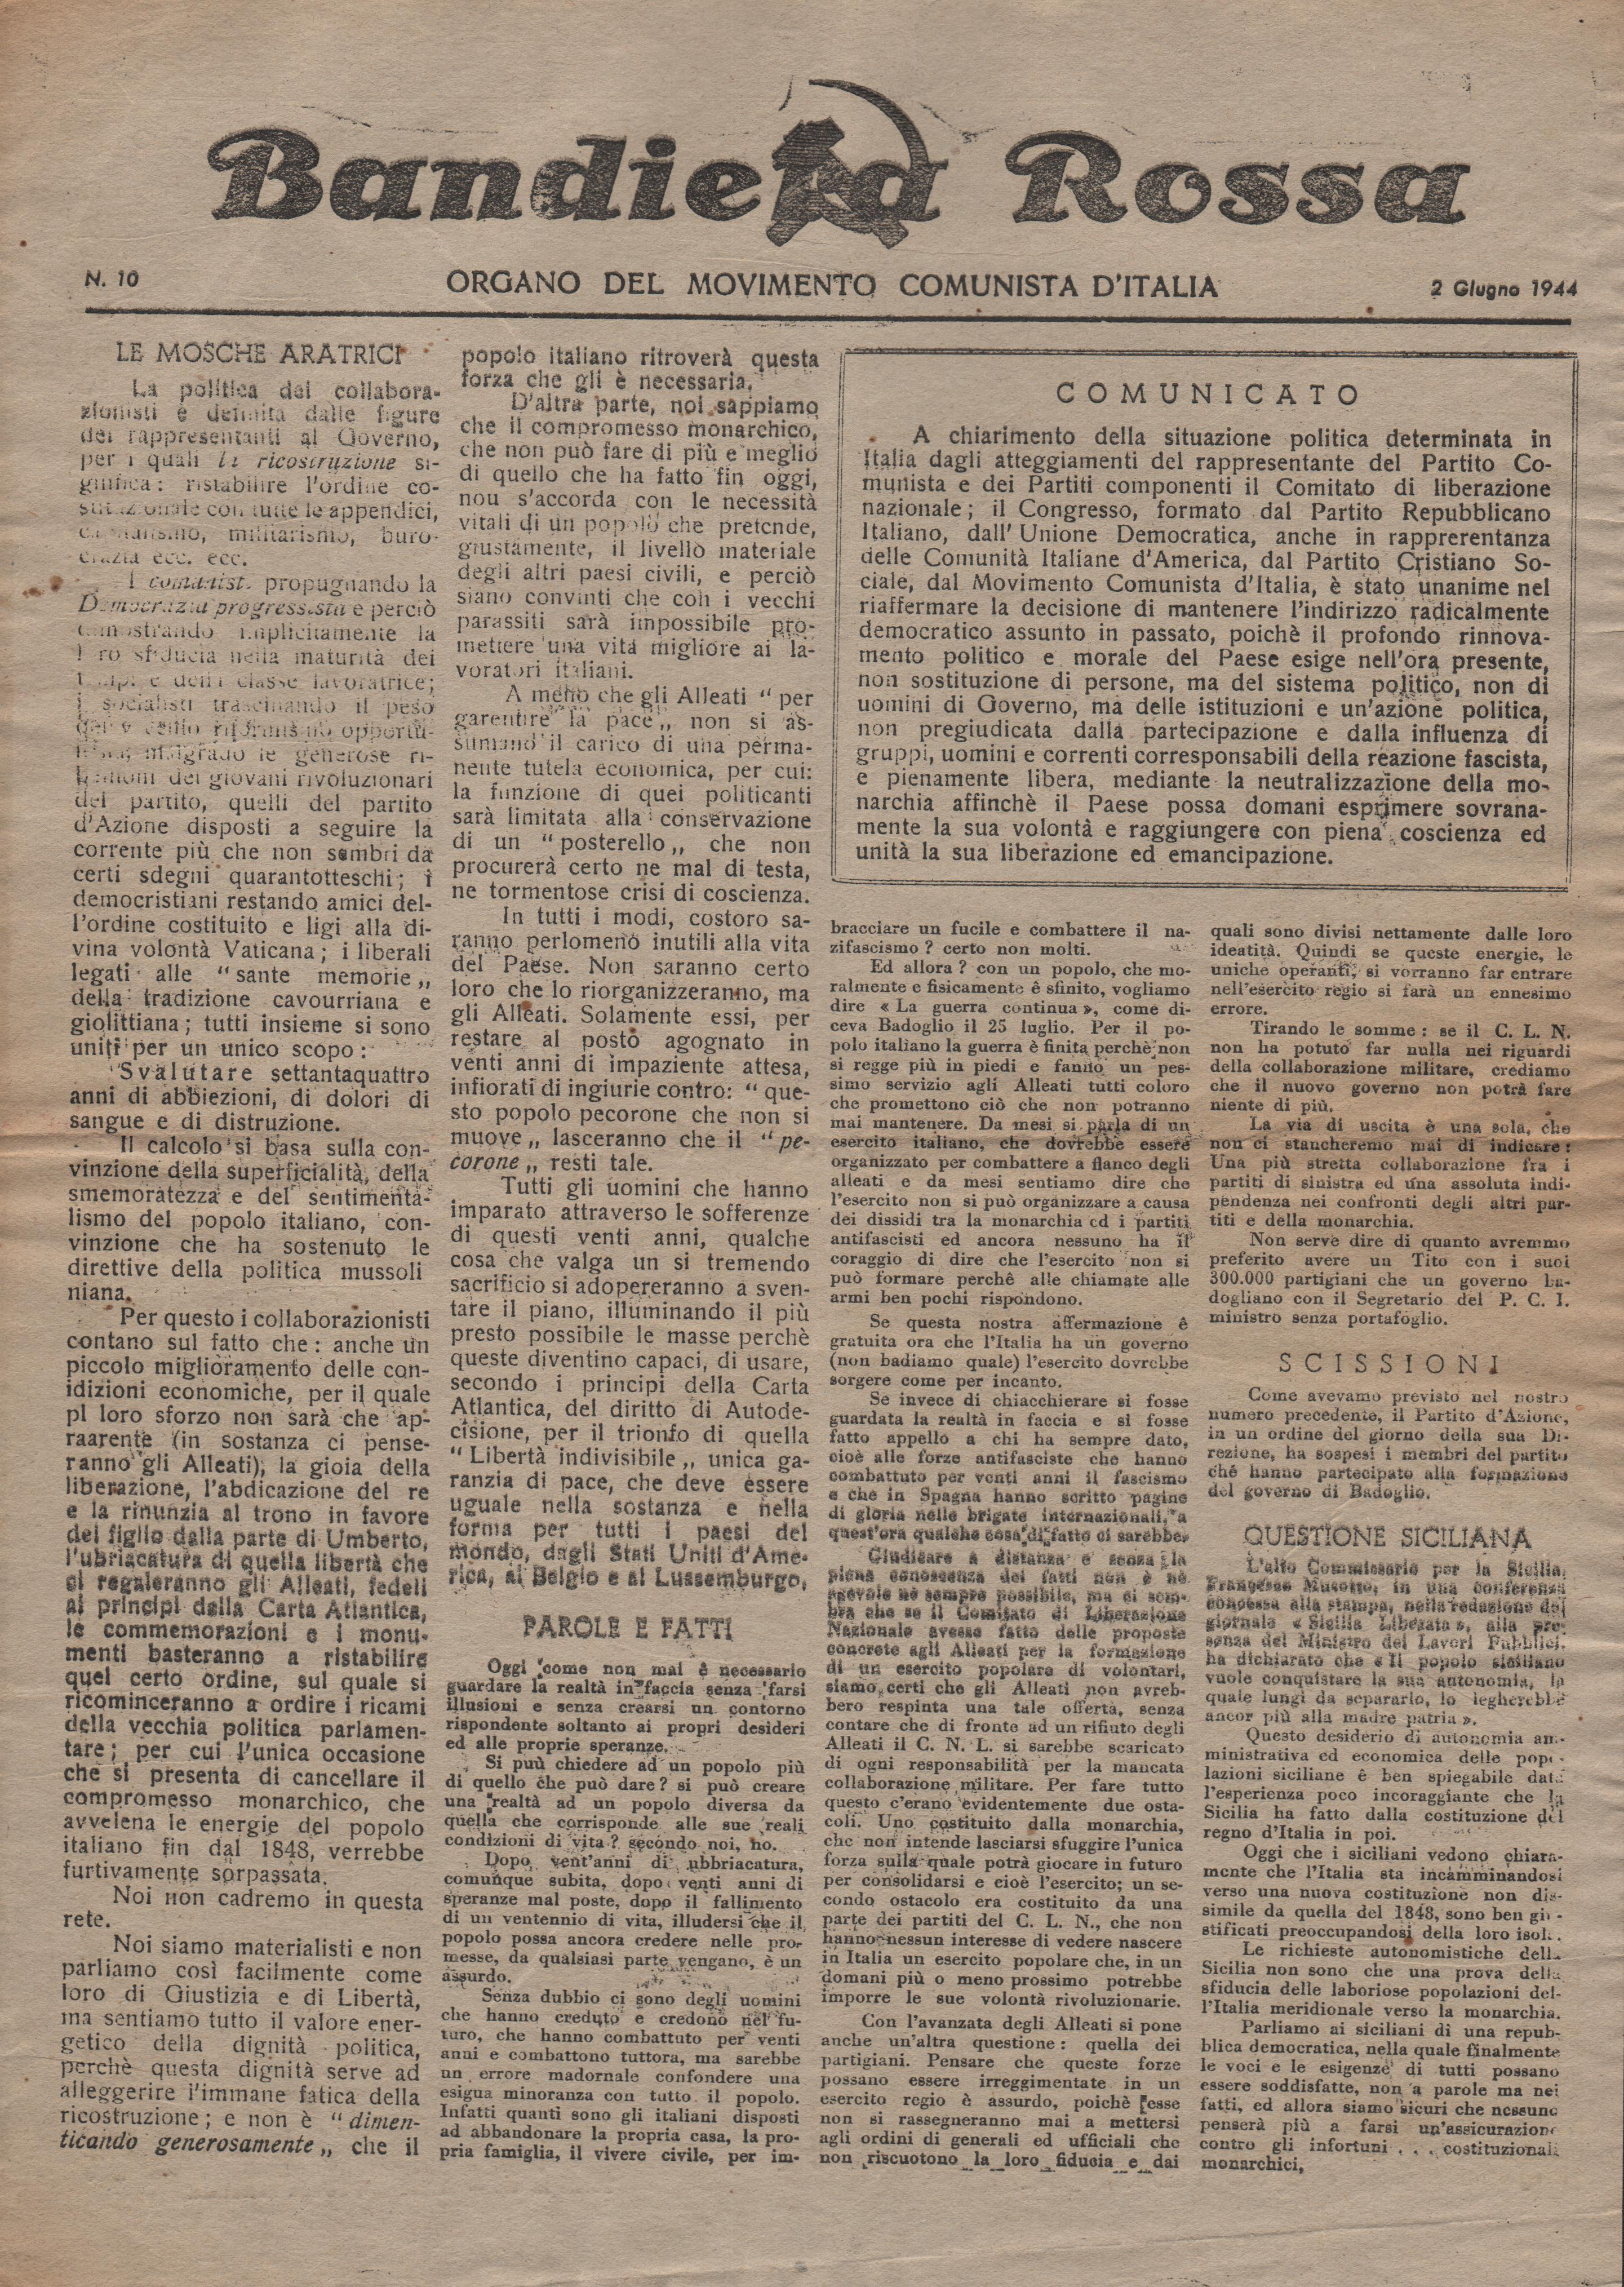 Bandiera Rossa n.10 (10 giugno 1944) - pag. 1